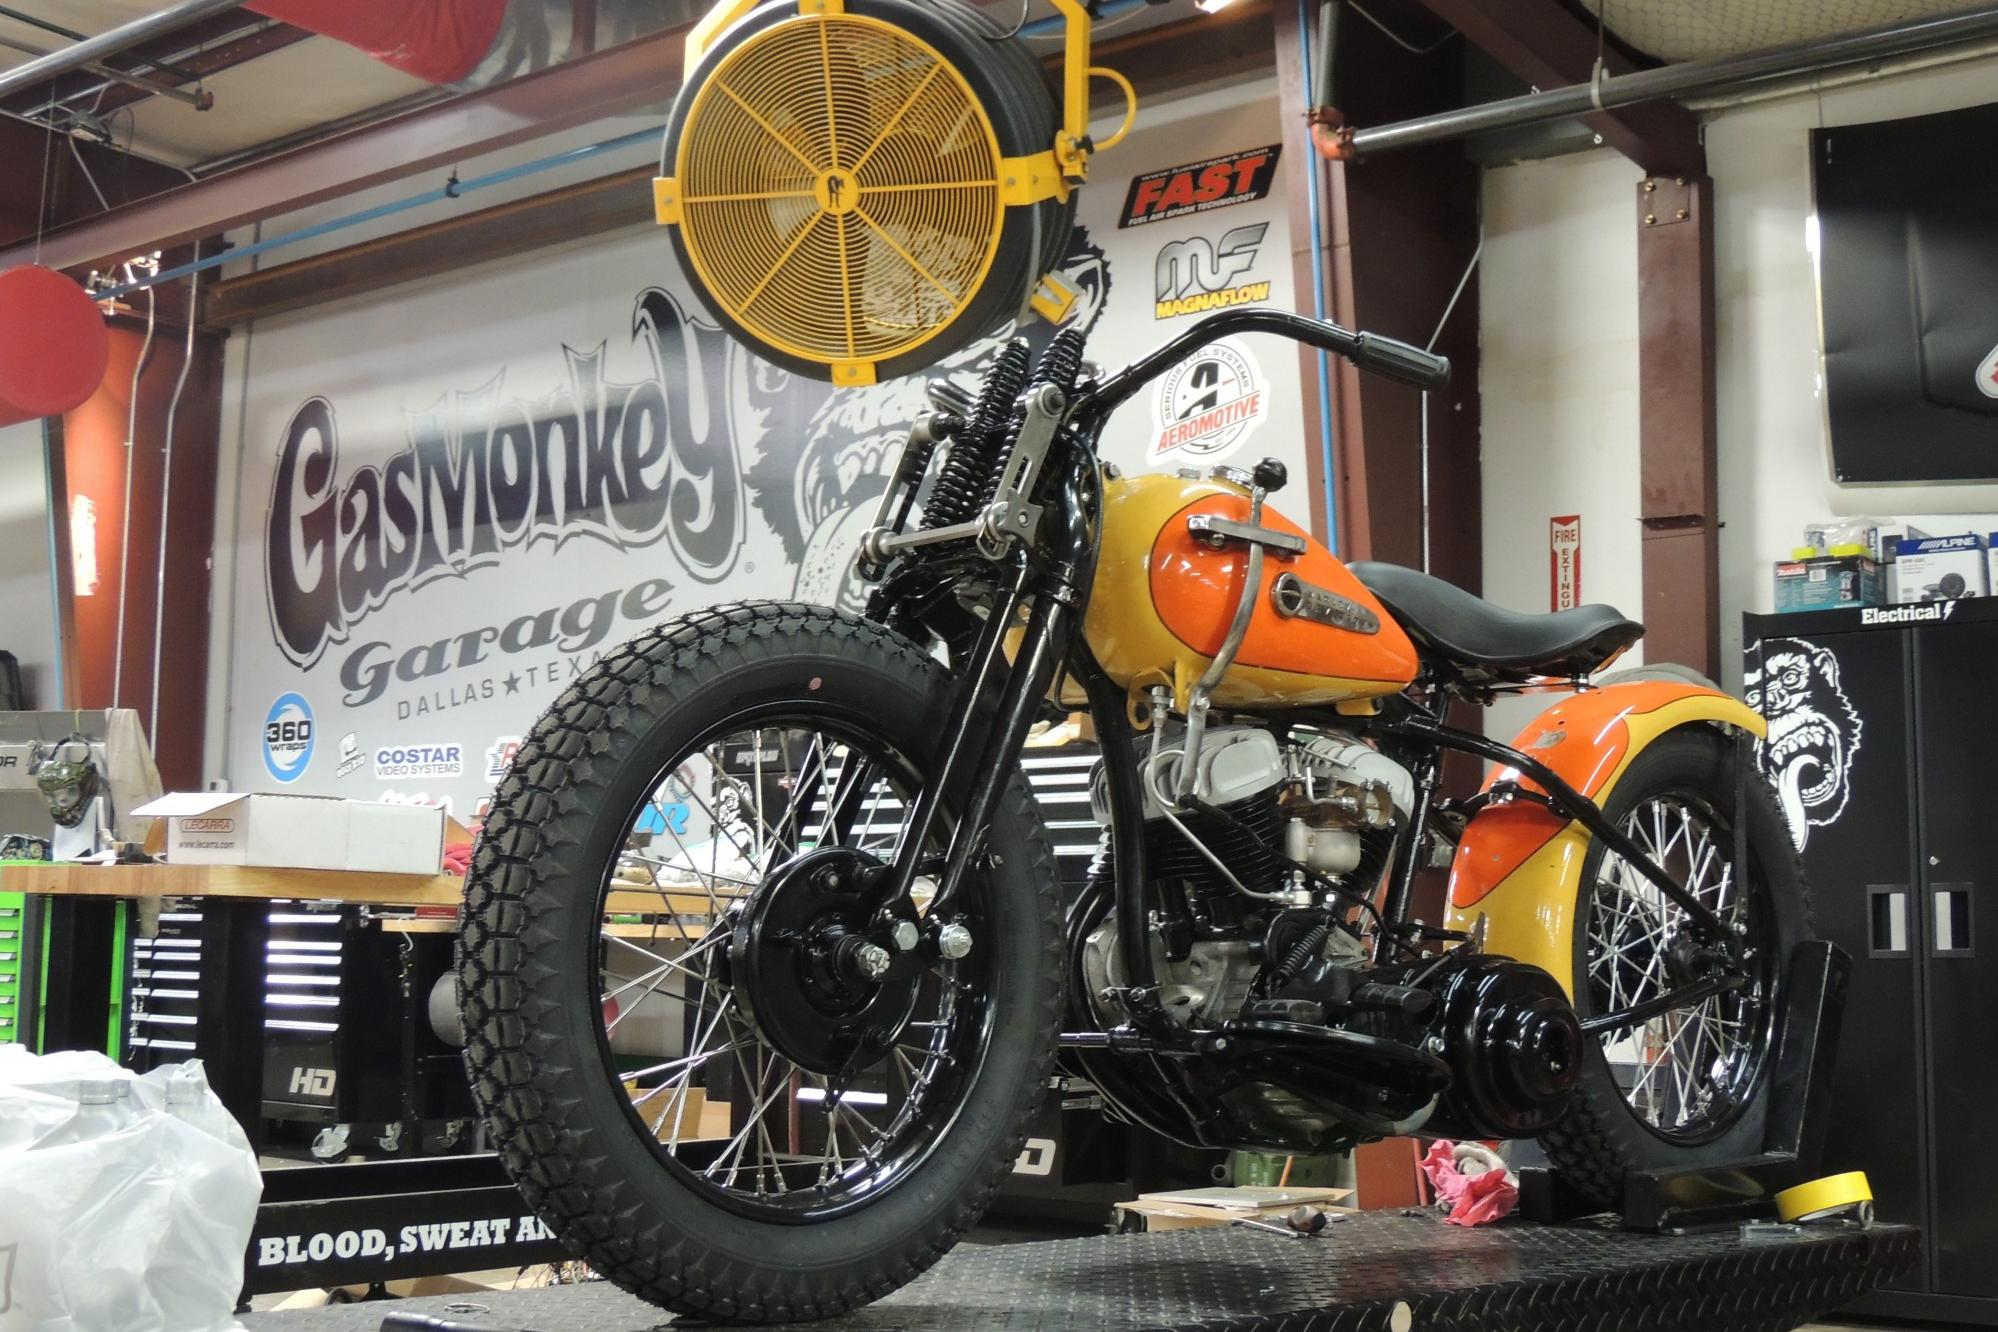 1942 Harley Davidson WLA Build | Fast N' Loud | Discovery